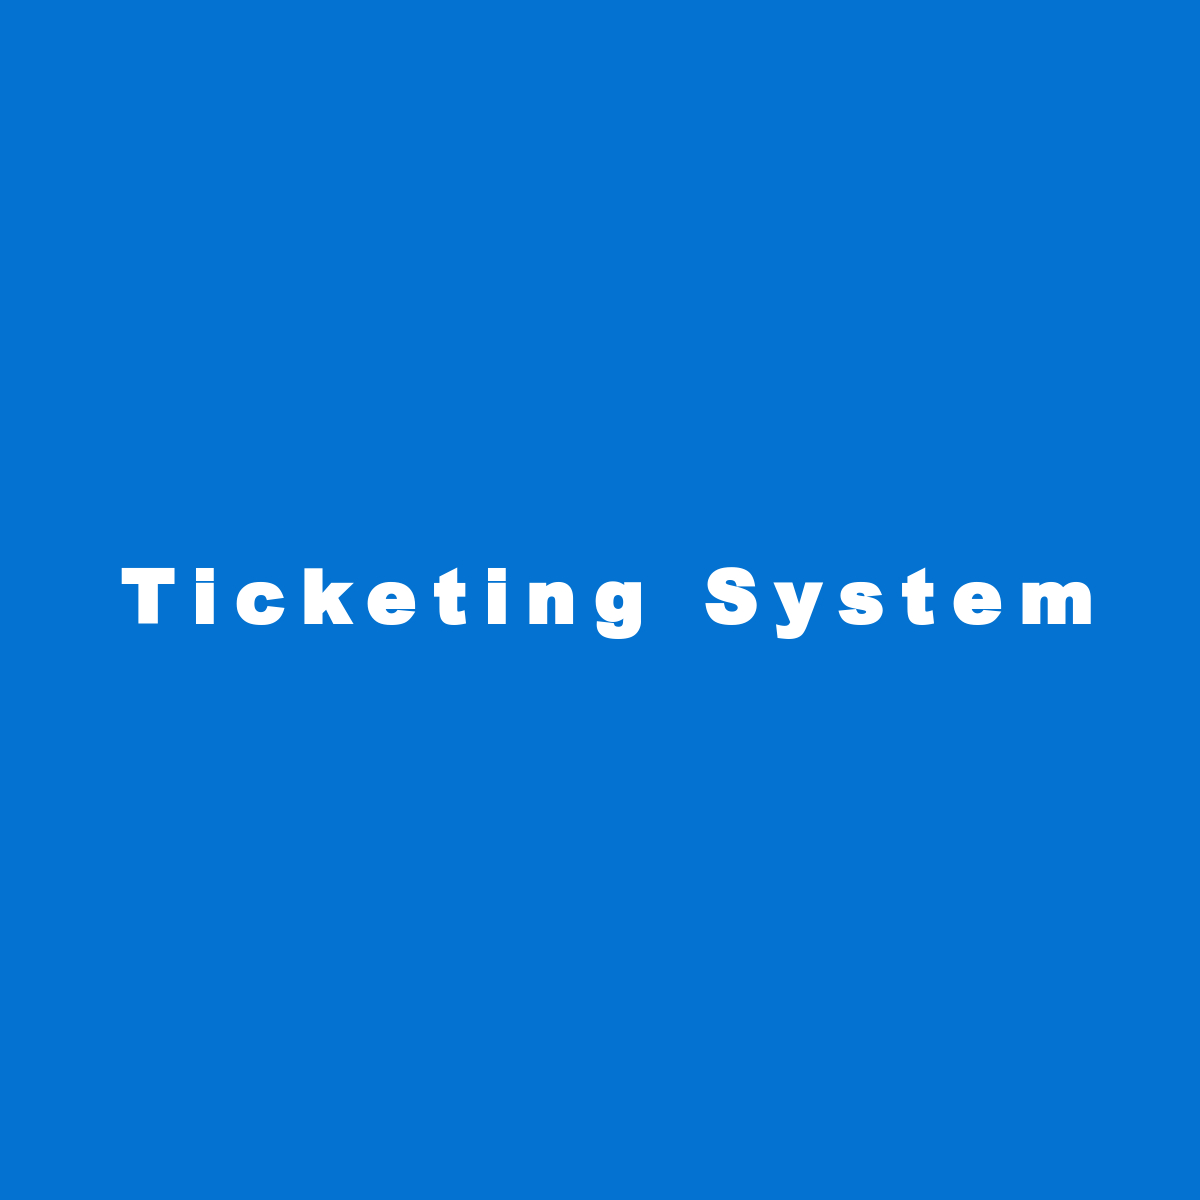 Laravel ticketing system